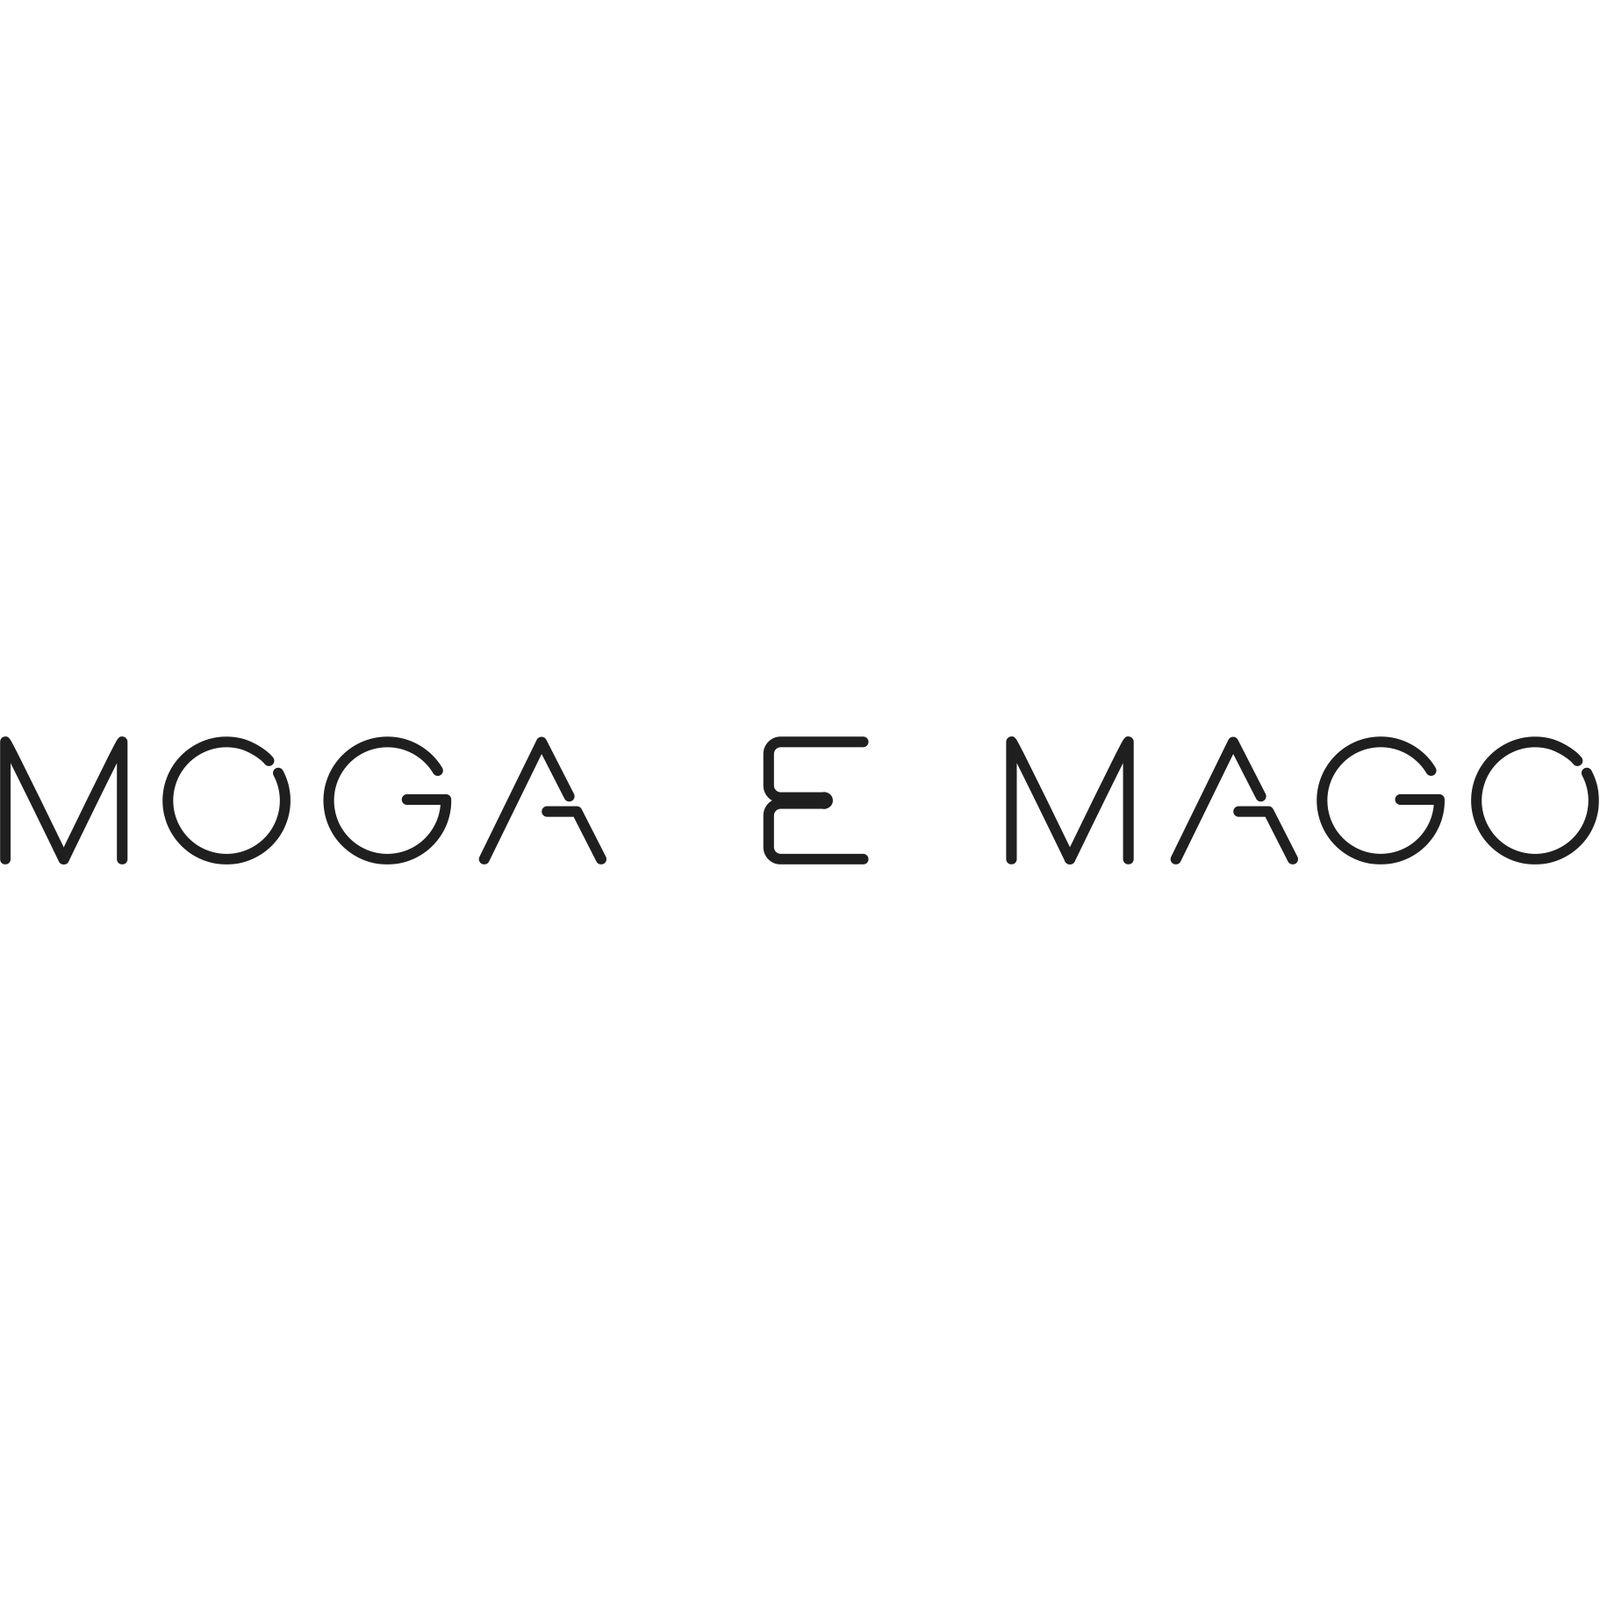 MOGA E MAGO (Afbeelding 1)